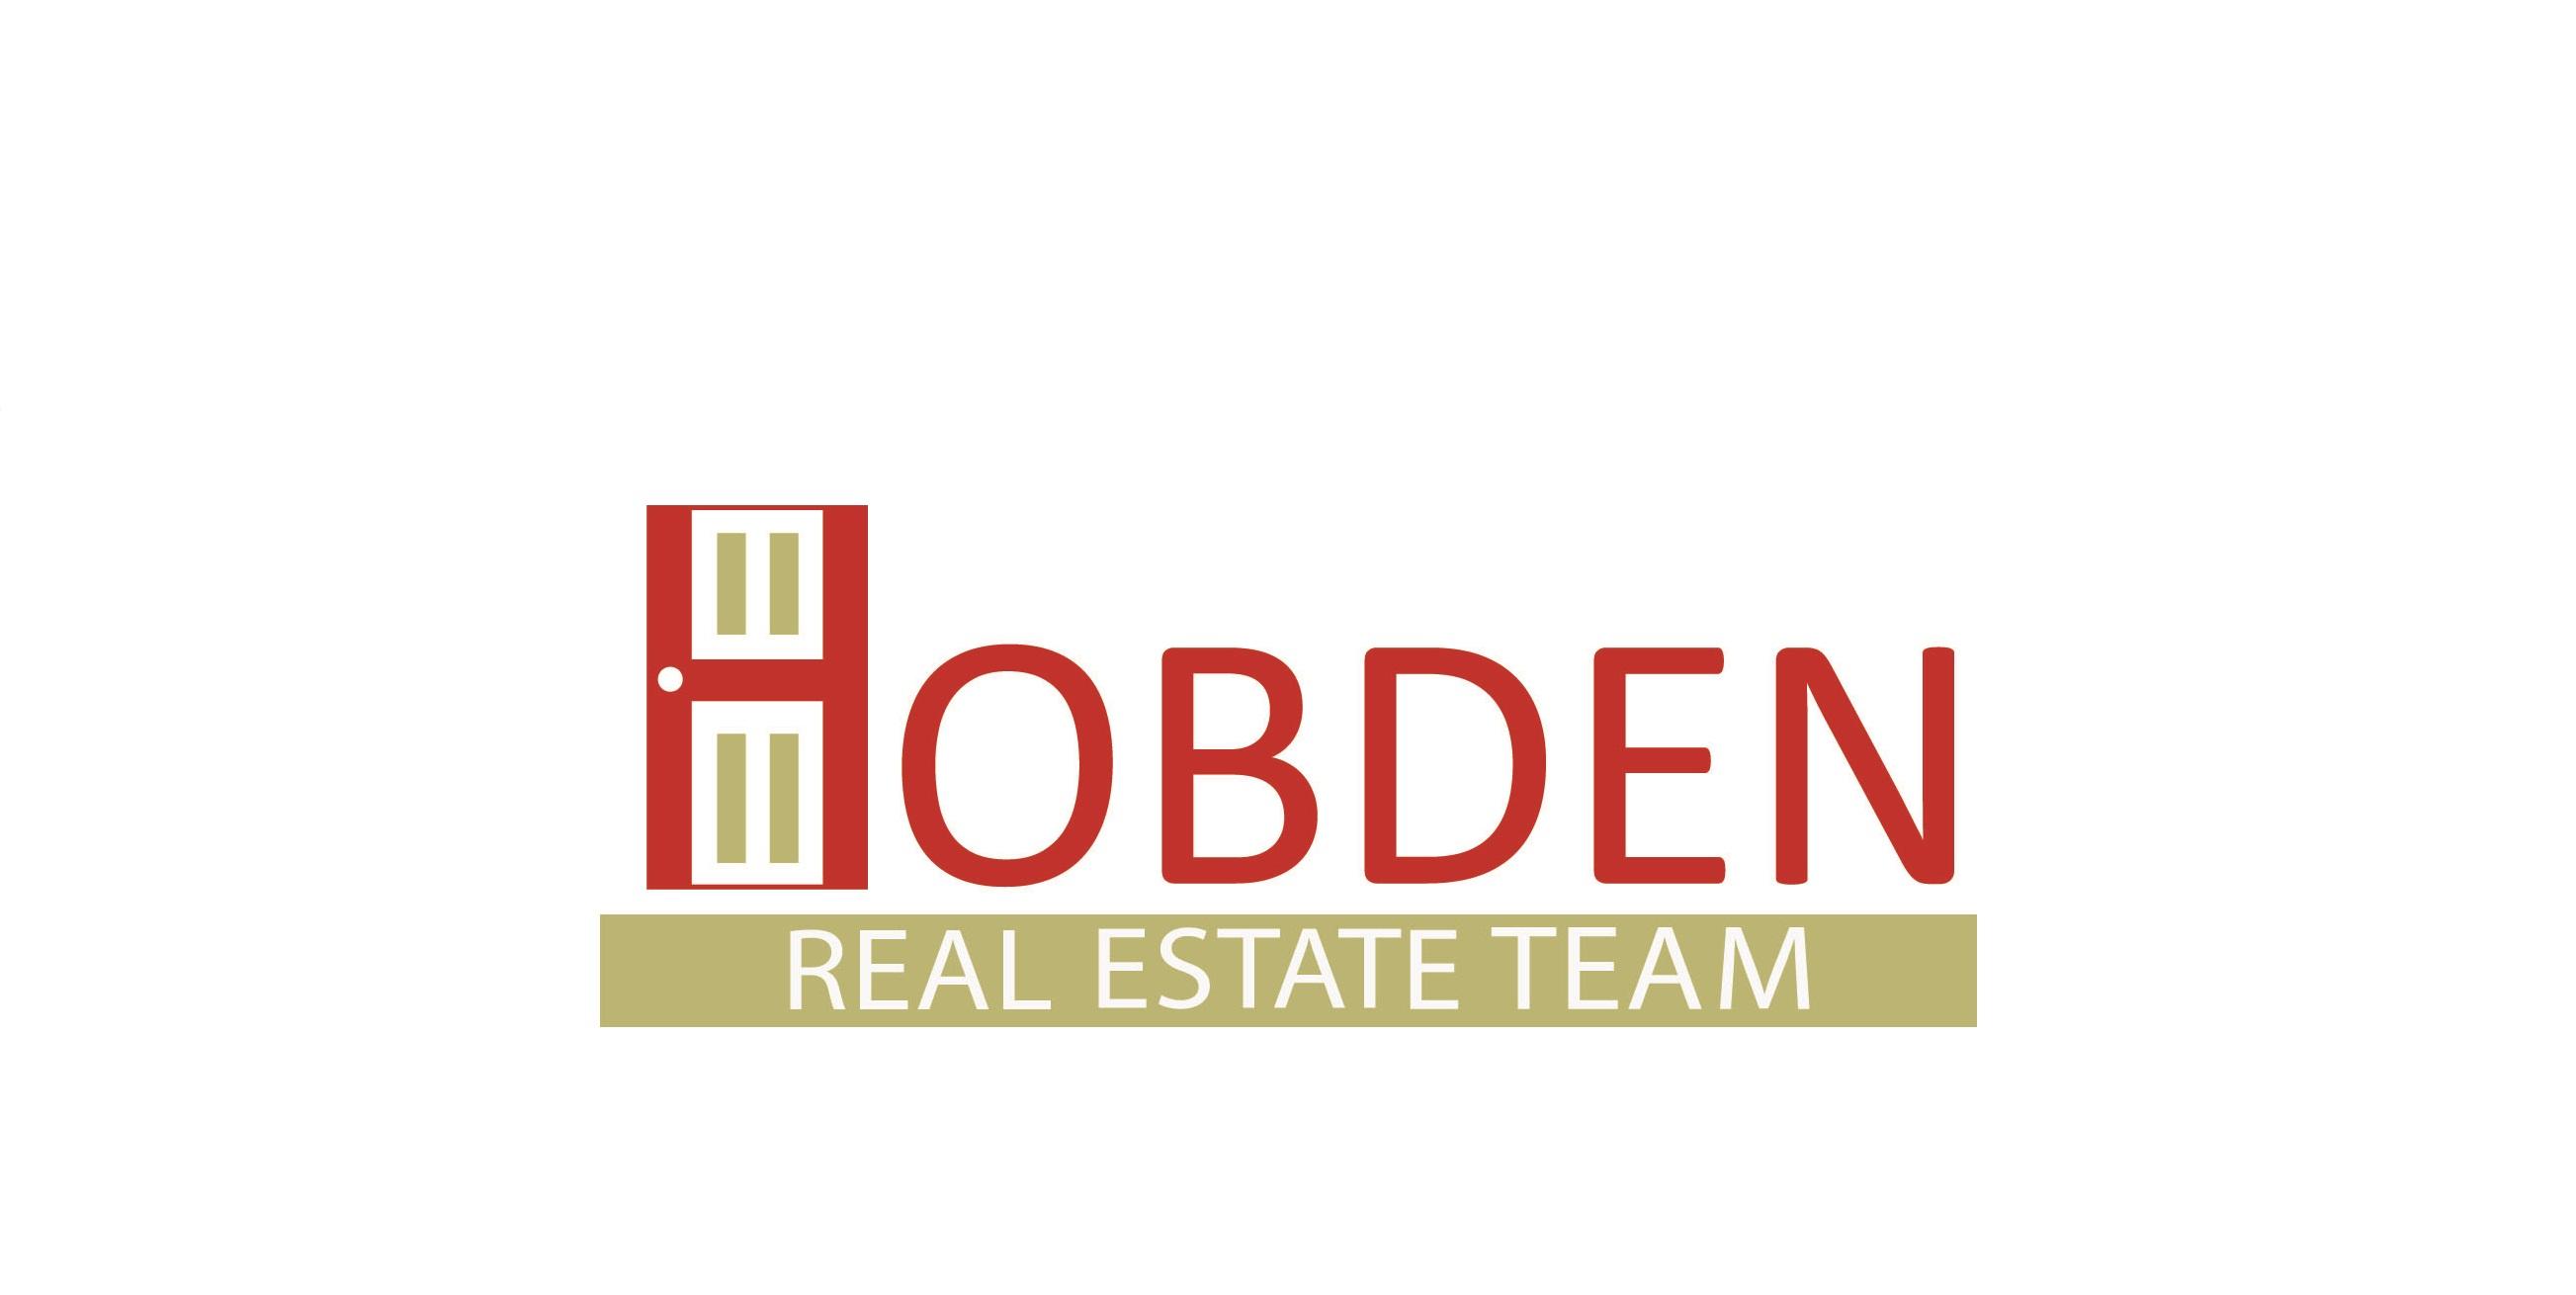 Hobden Team Logo